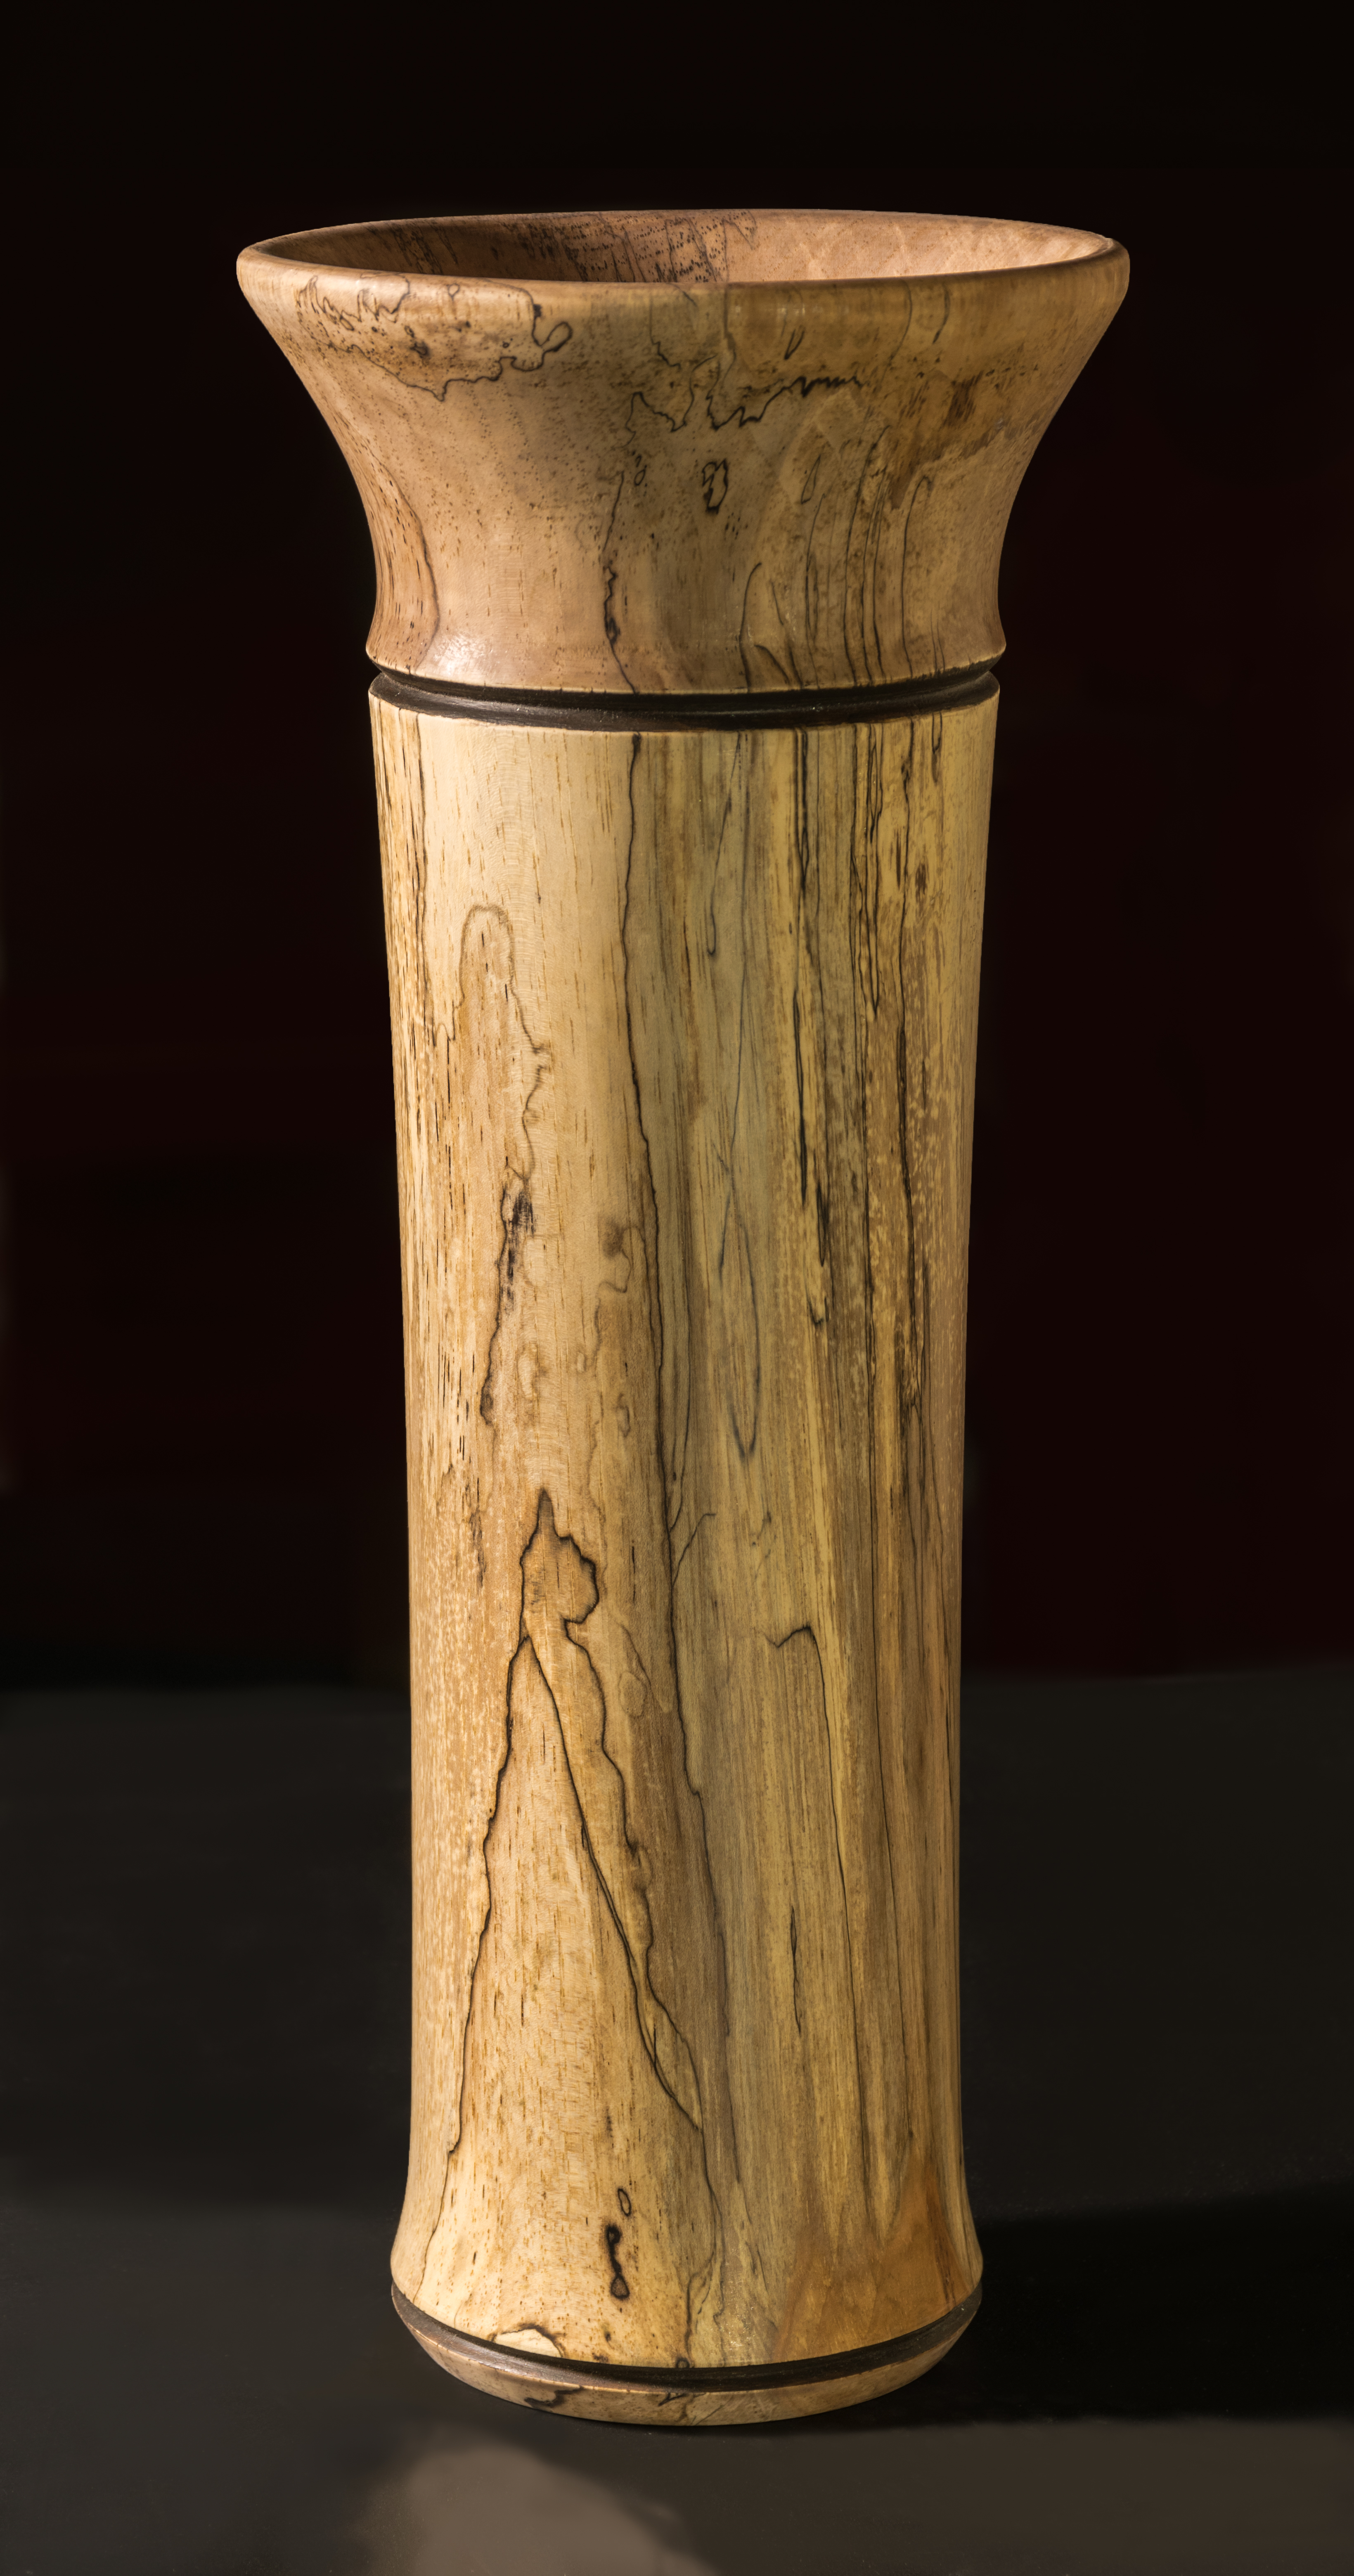 Roger Harvey - Spalted Pecan Vessel